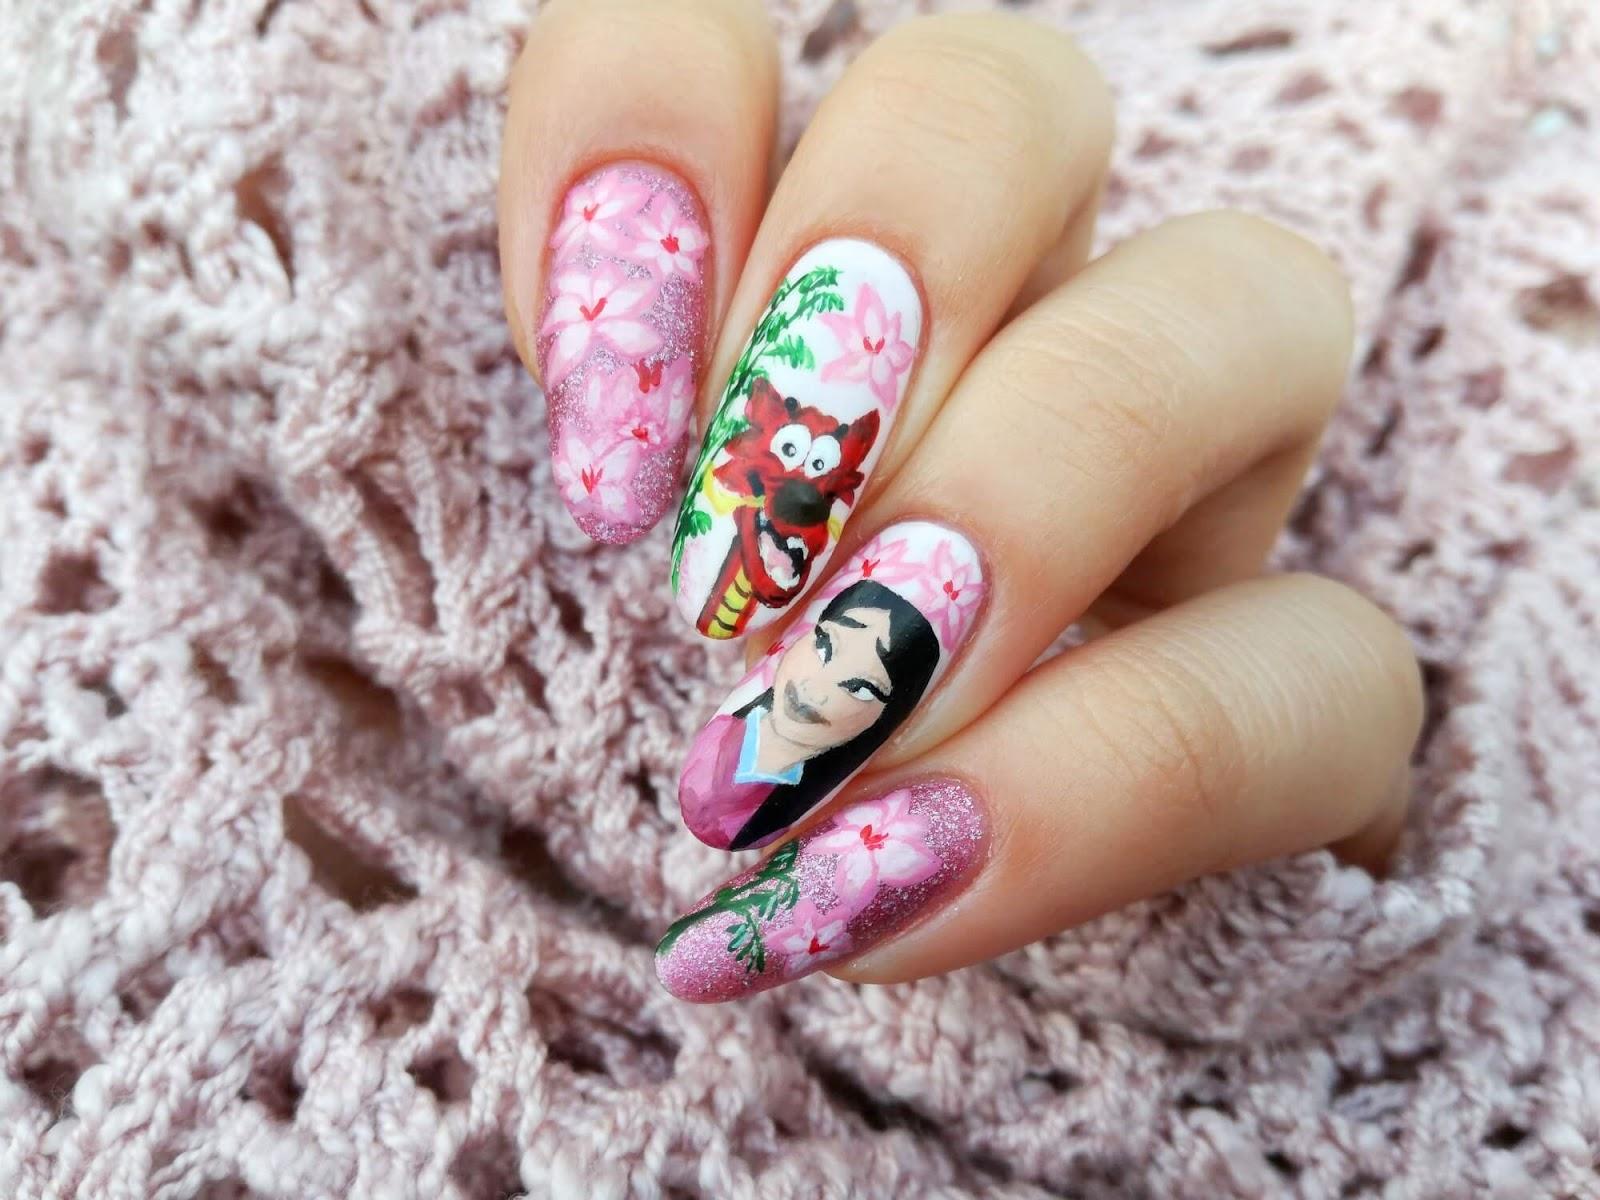 bajkowe paznokcie z mulan